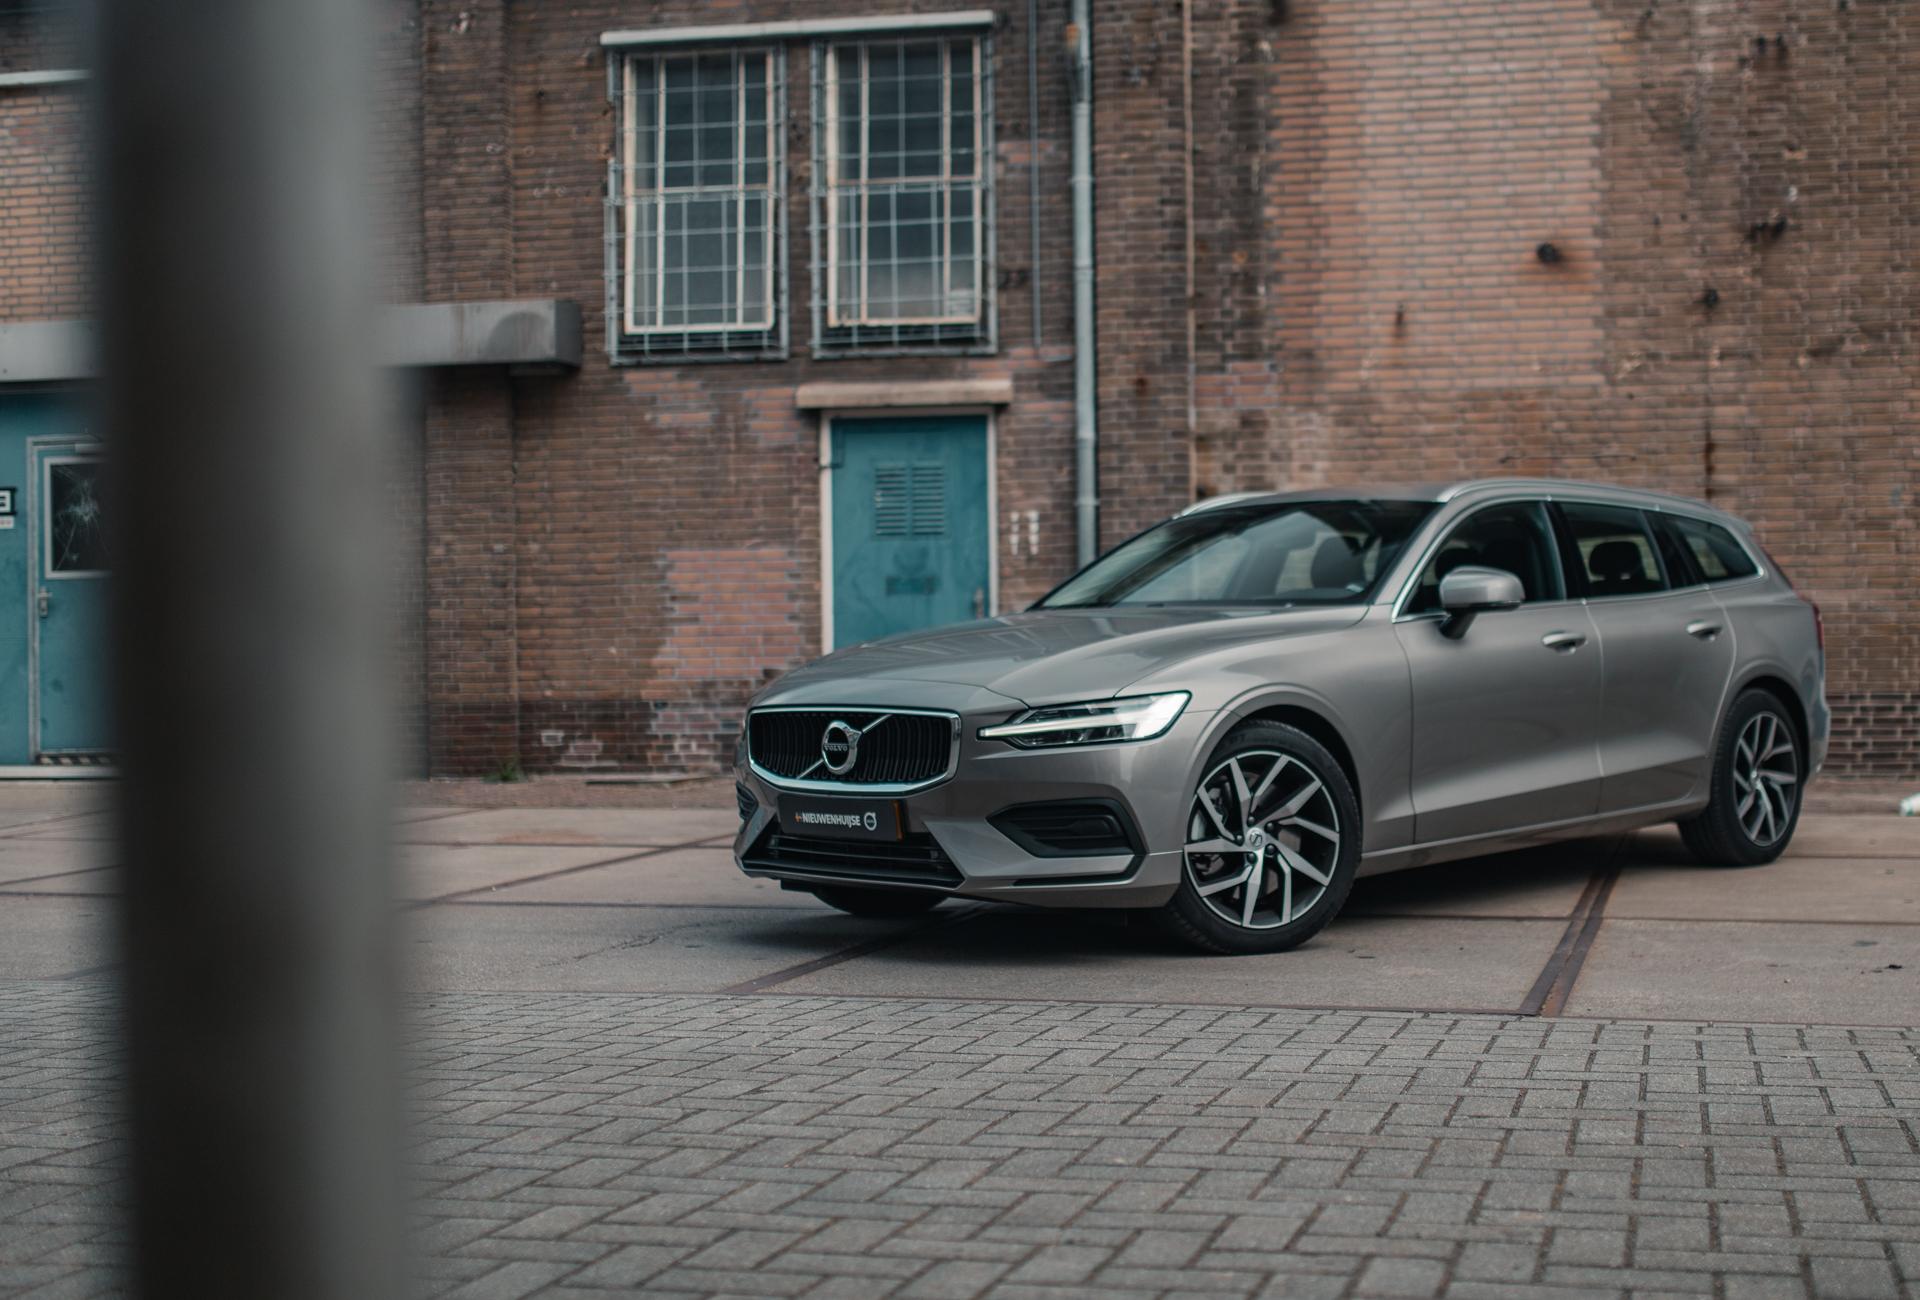 APK Keuring Volvo Nieuwenhuijse